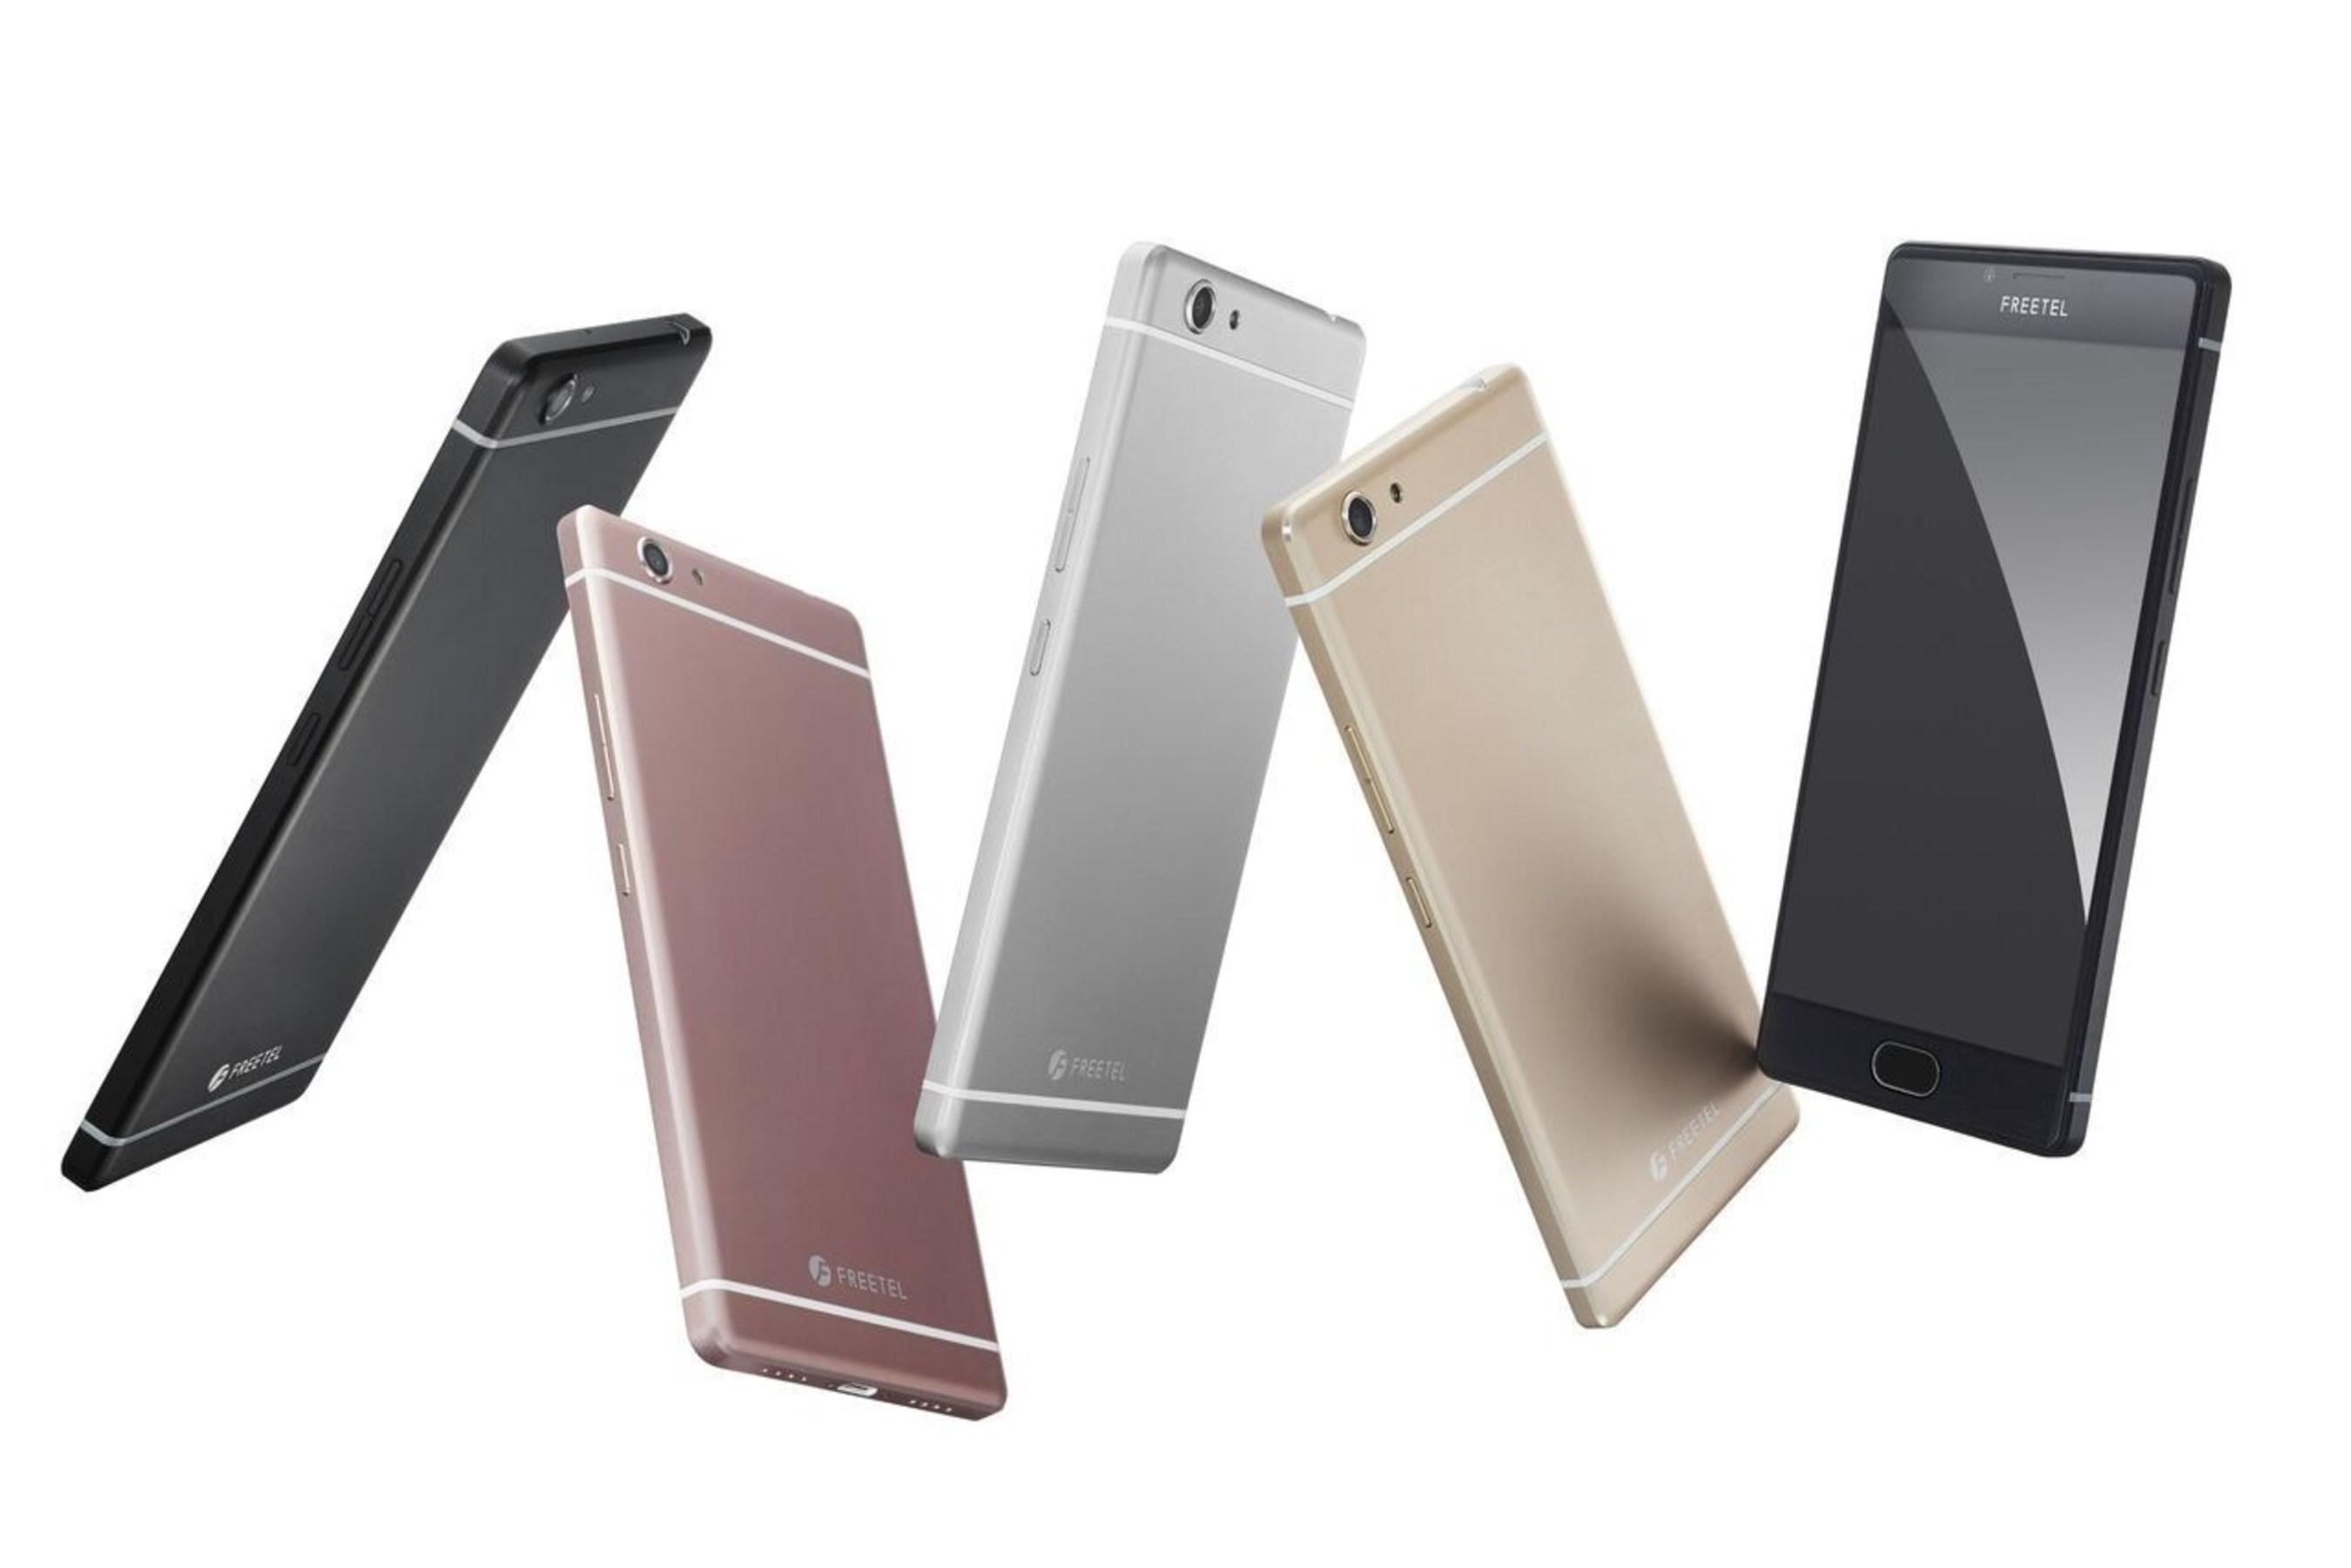 The FREETEL REI Smartphone